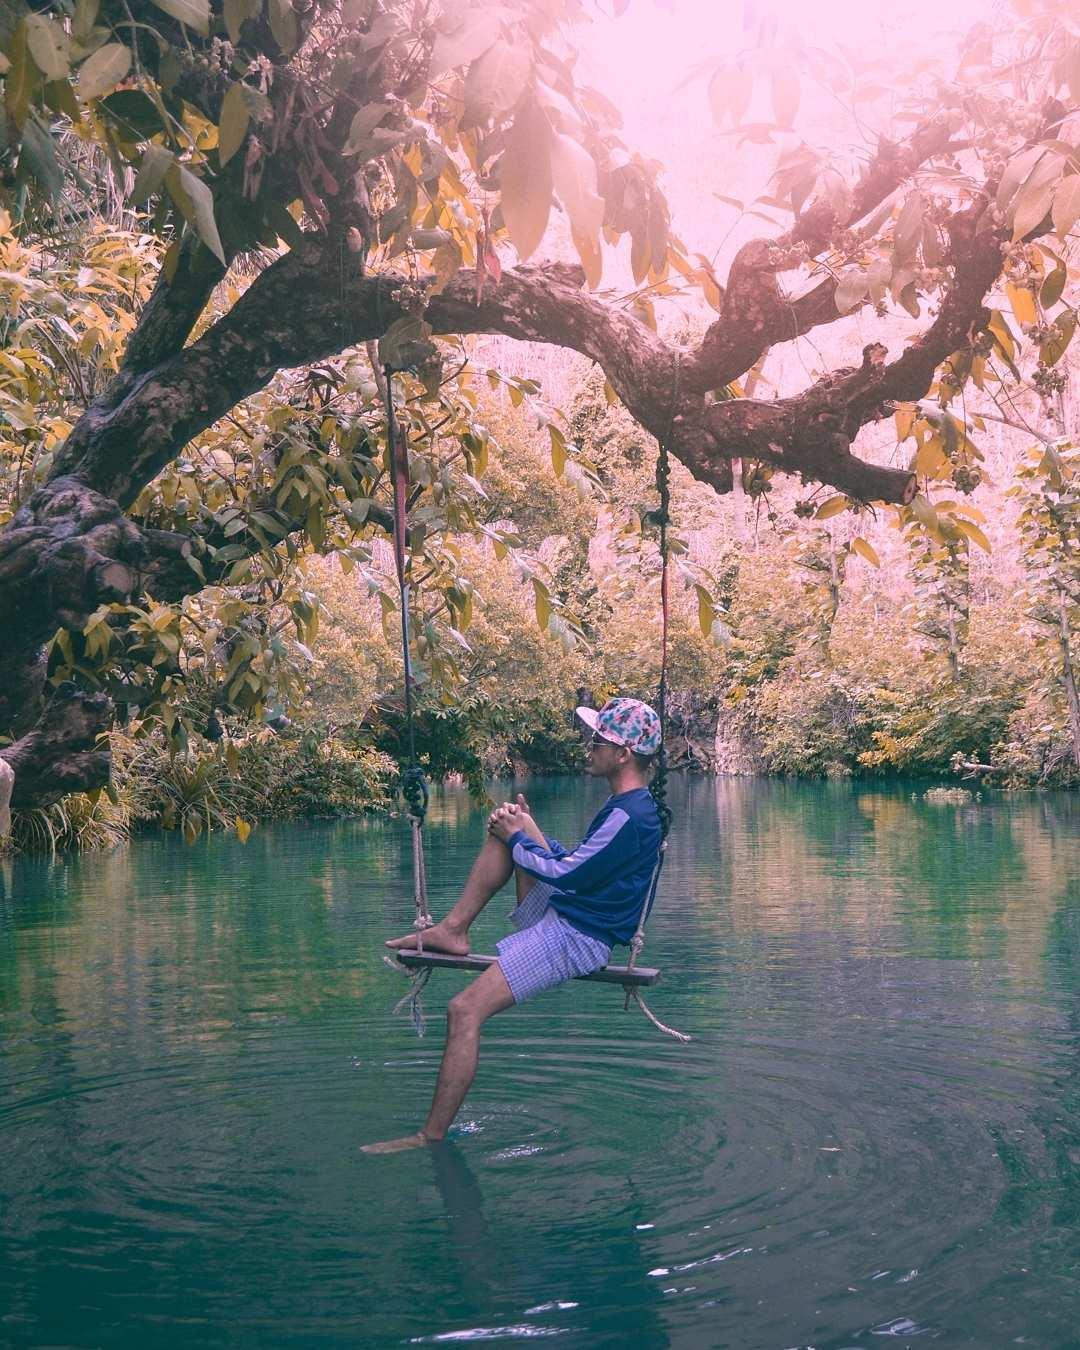 Berfoto di Ayunan Sungai Maron Pacitan, Image From @azayn_official